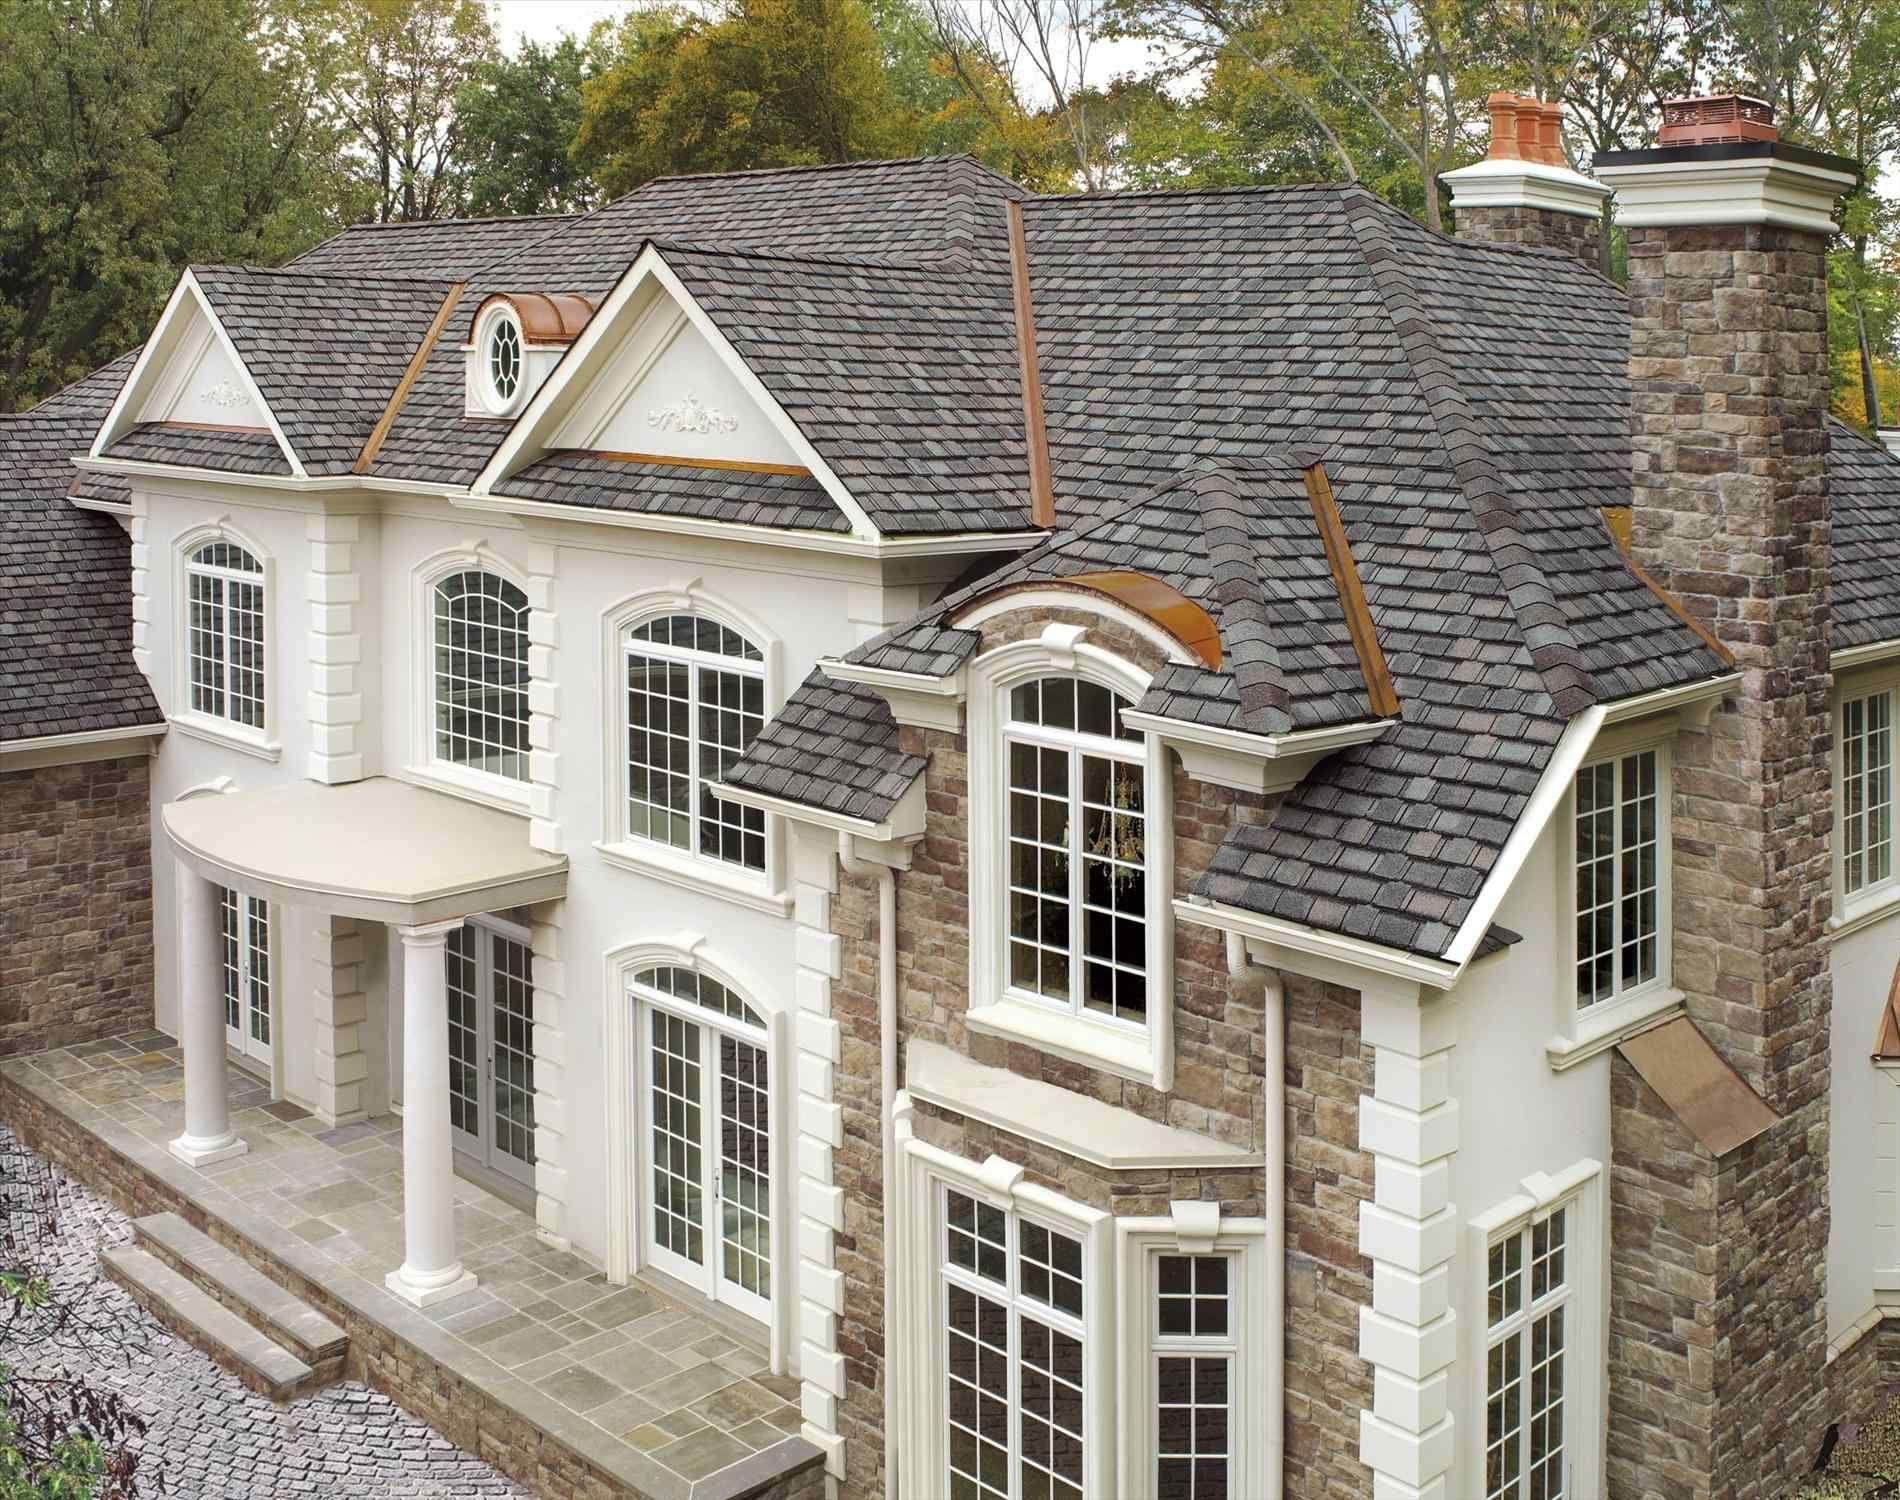 Best Blue Roof Shingles Weatherwood Roof Shingles 00000 Roof 400 x 300